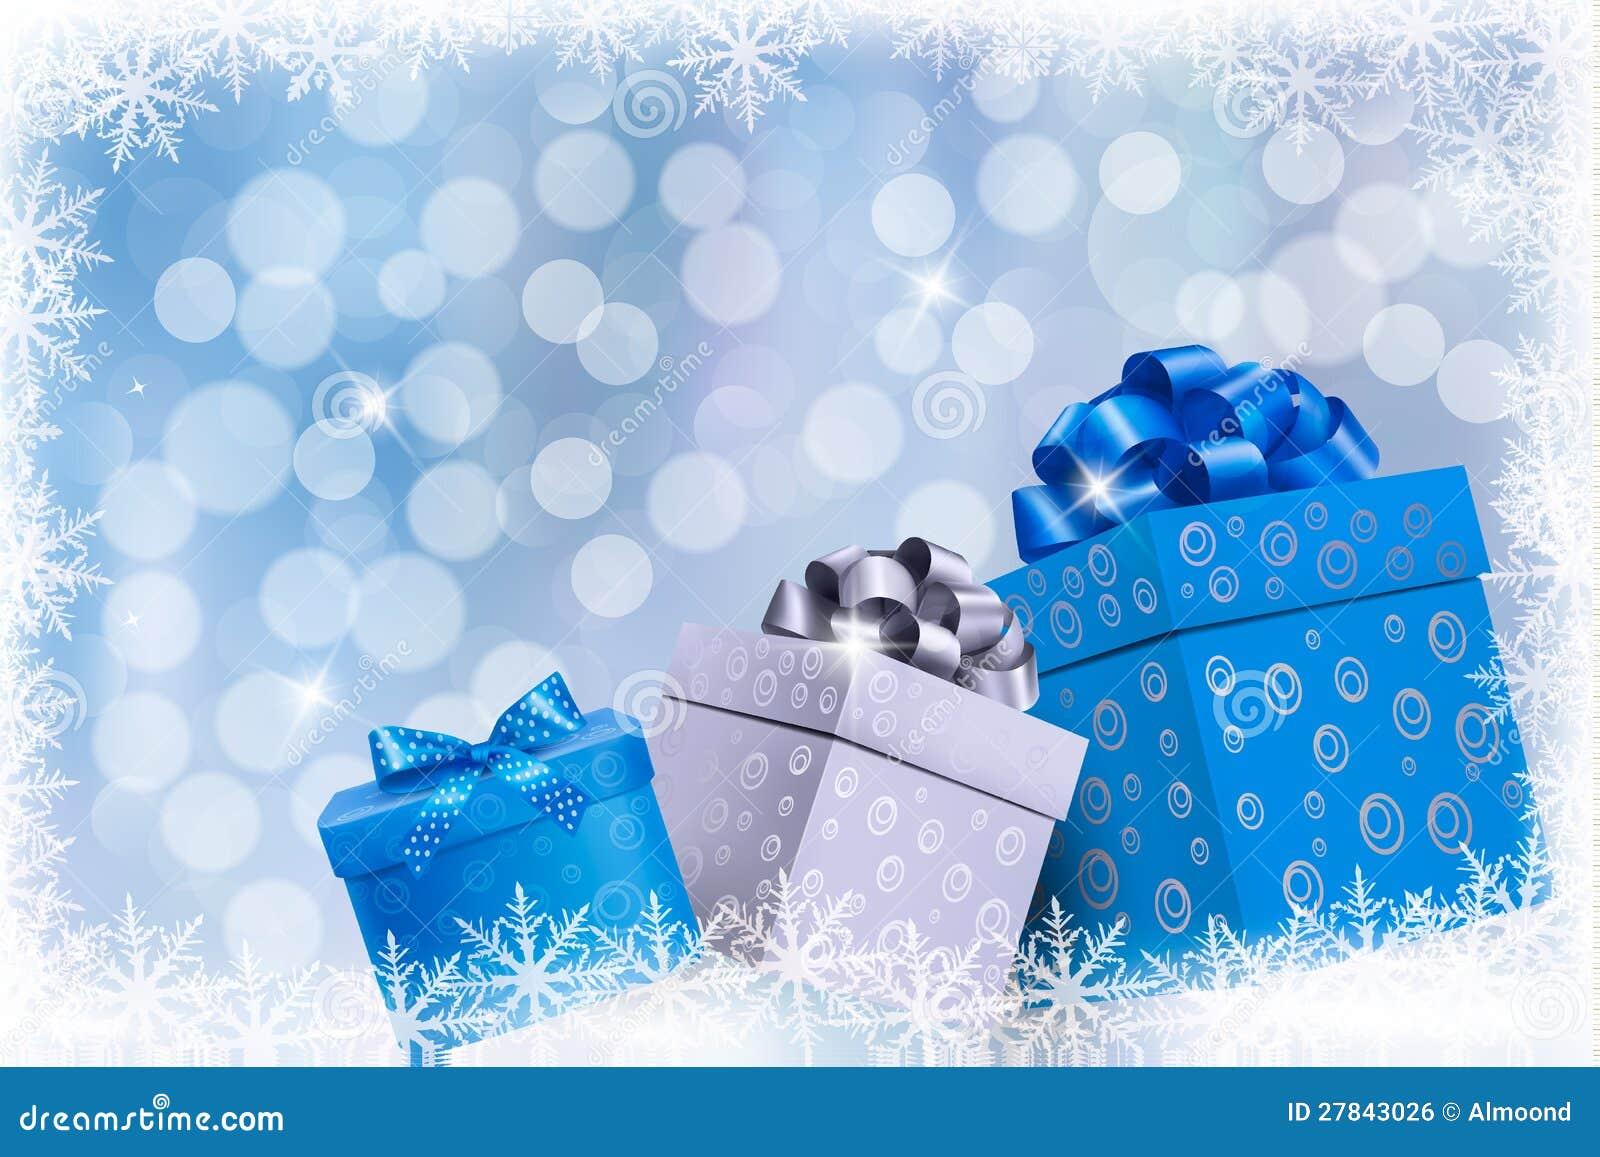 christmas blue background - Christmas Blue